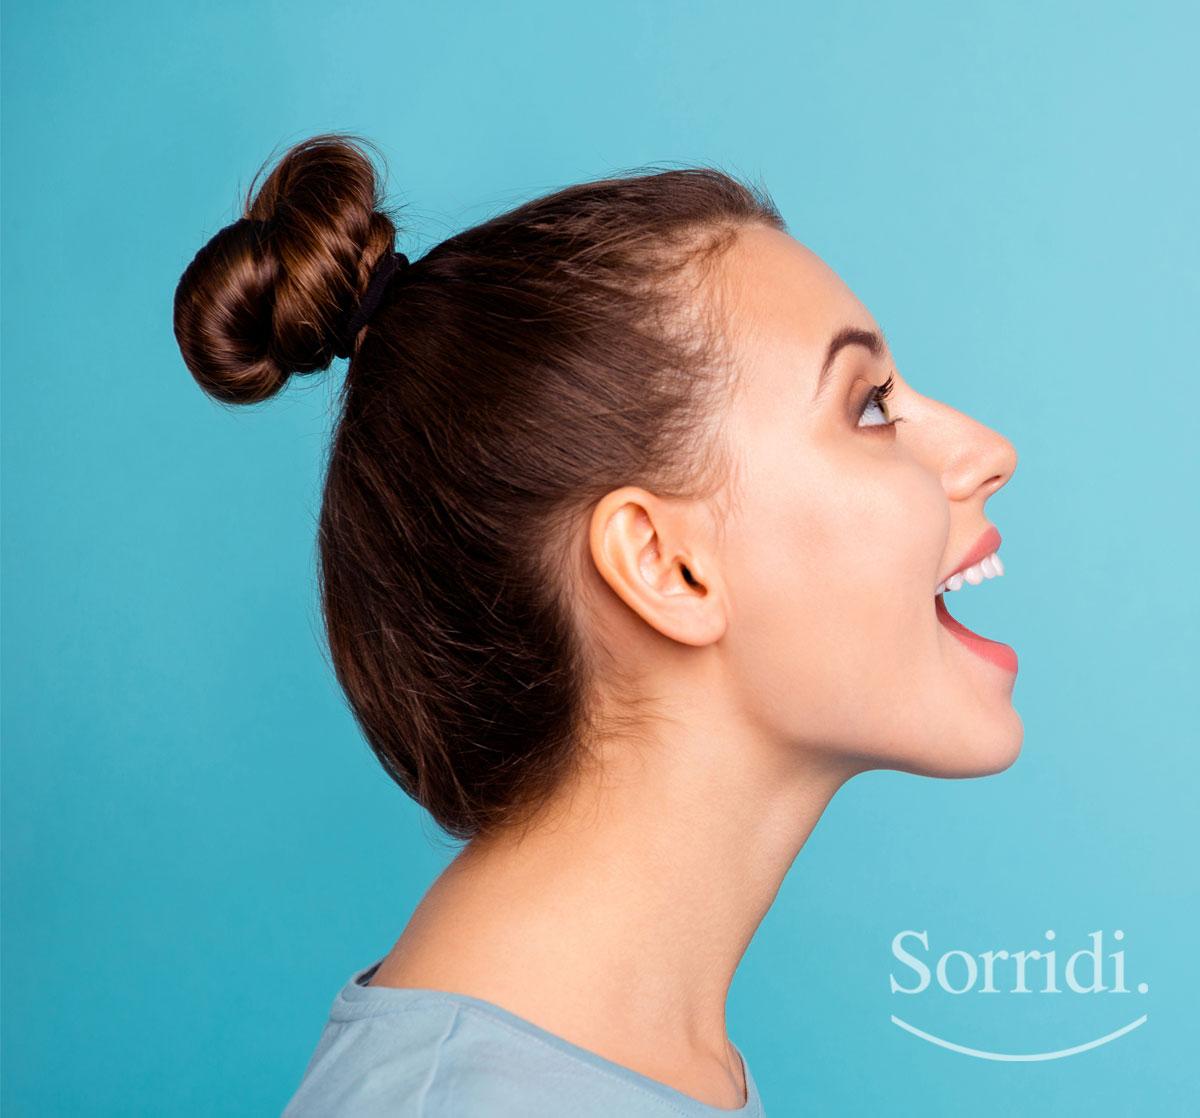 Sorridi-ch-magazine-morso-aperto